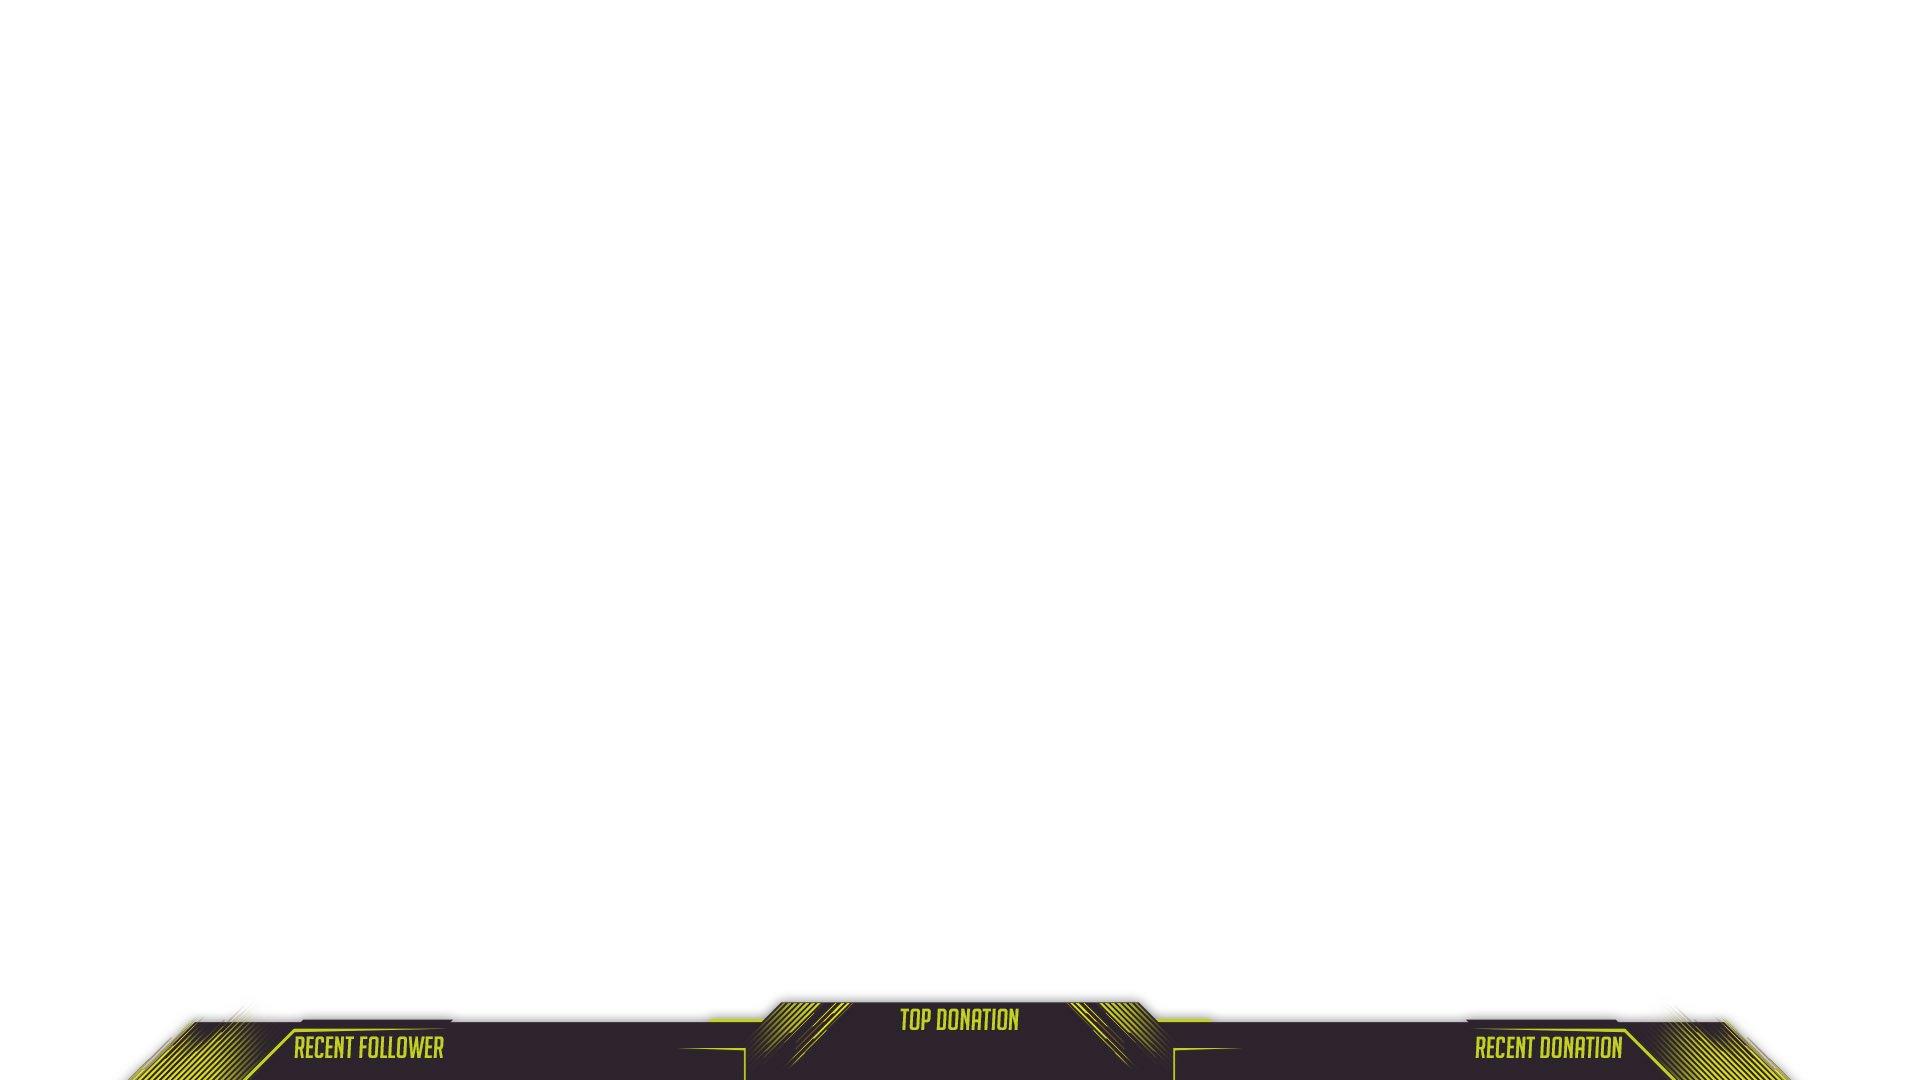 Fifa 18 Twitch Overlay